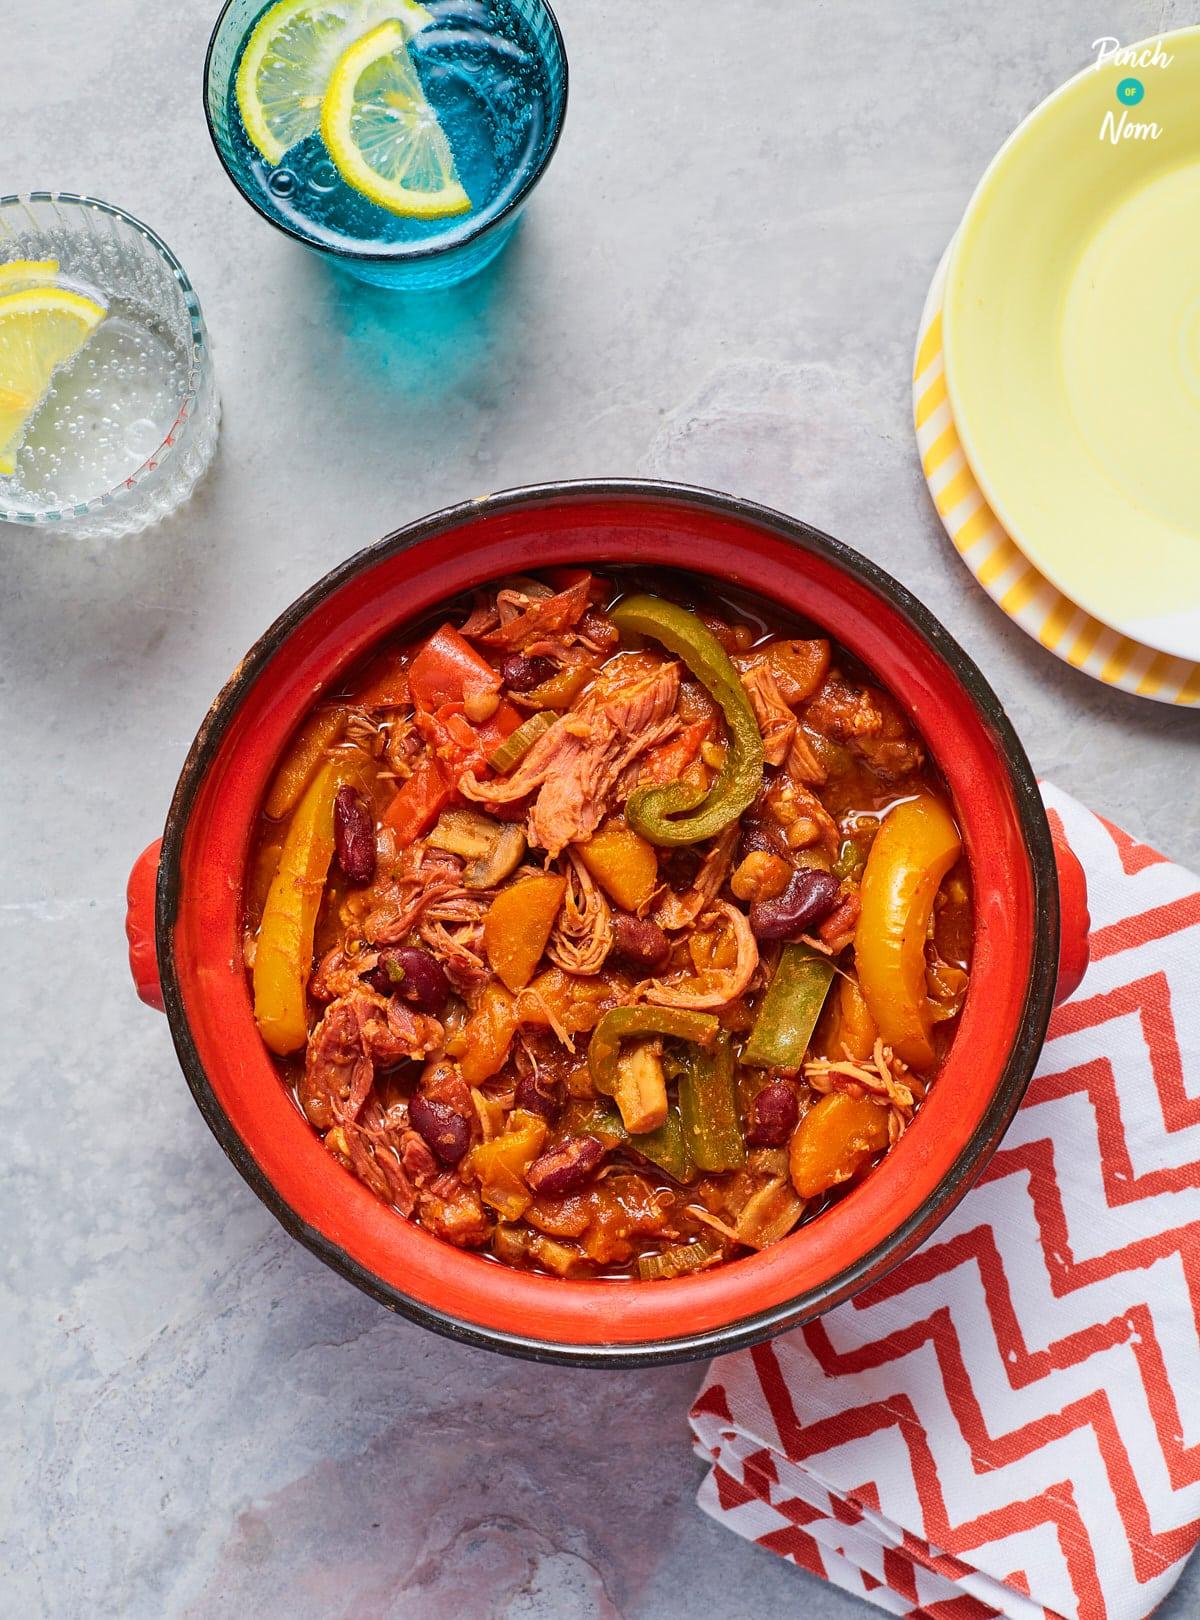 Campfire Stew - Pinch of Nom Slimming Recipes